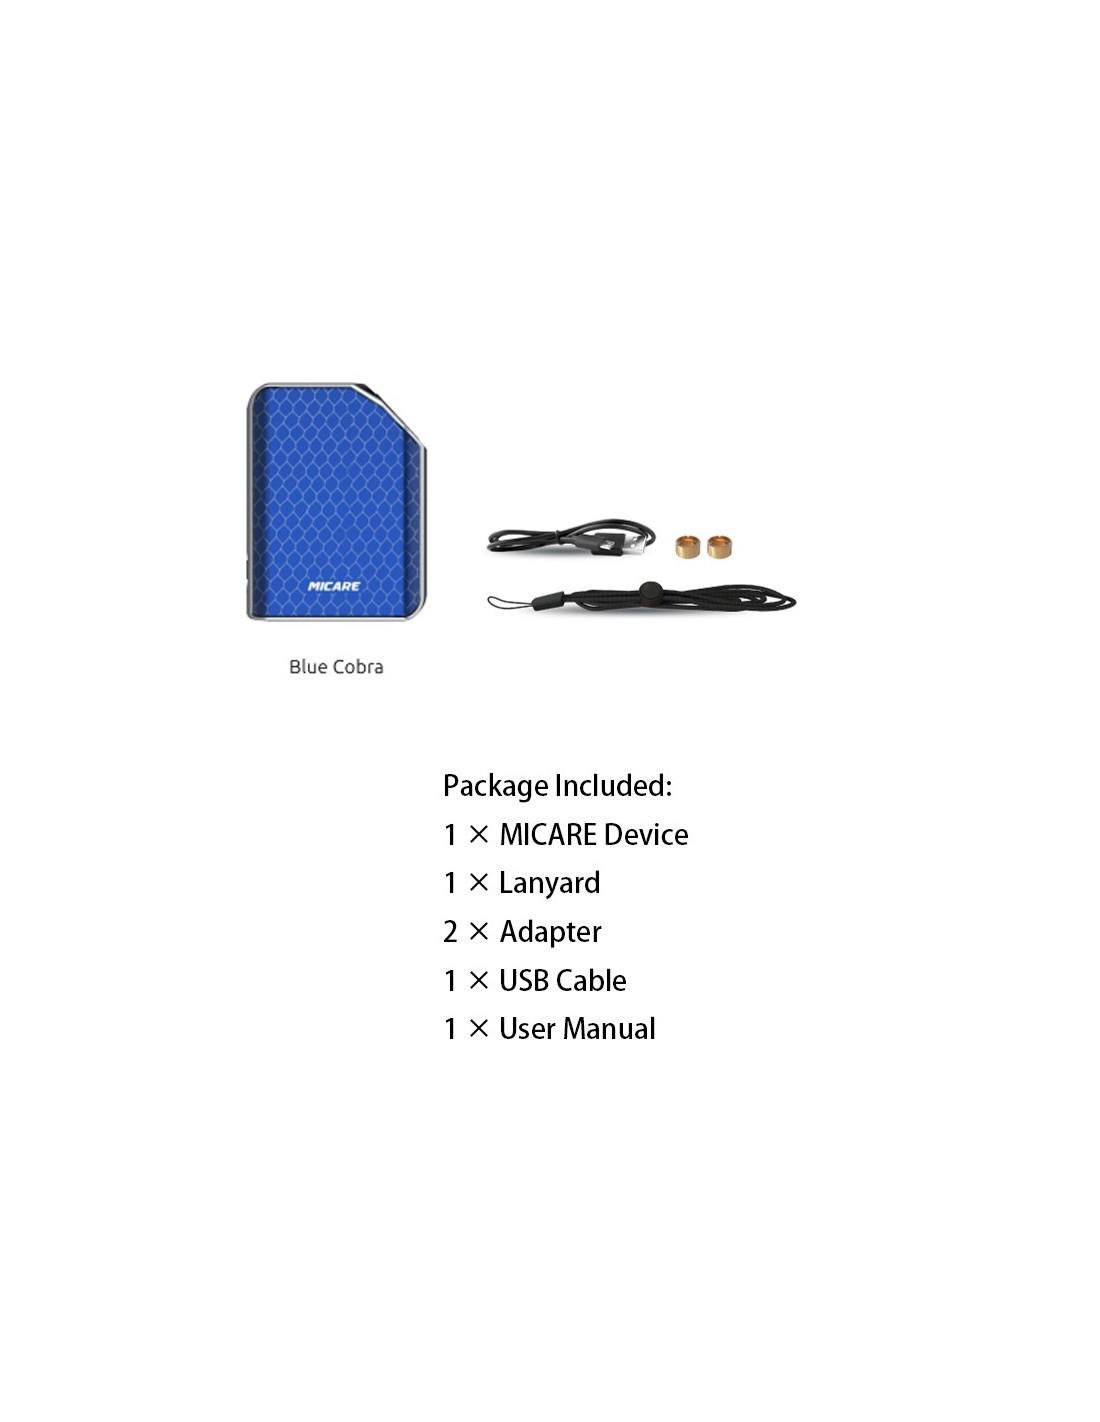 Smok Micare Mod 700mah Battery With Cartridge Option